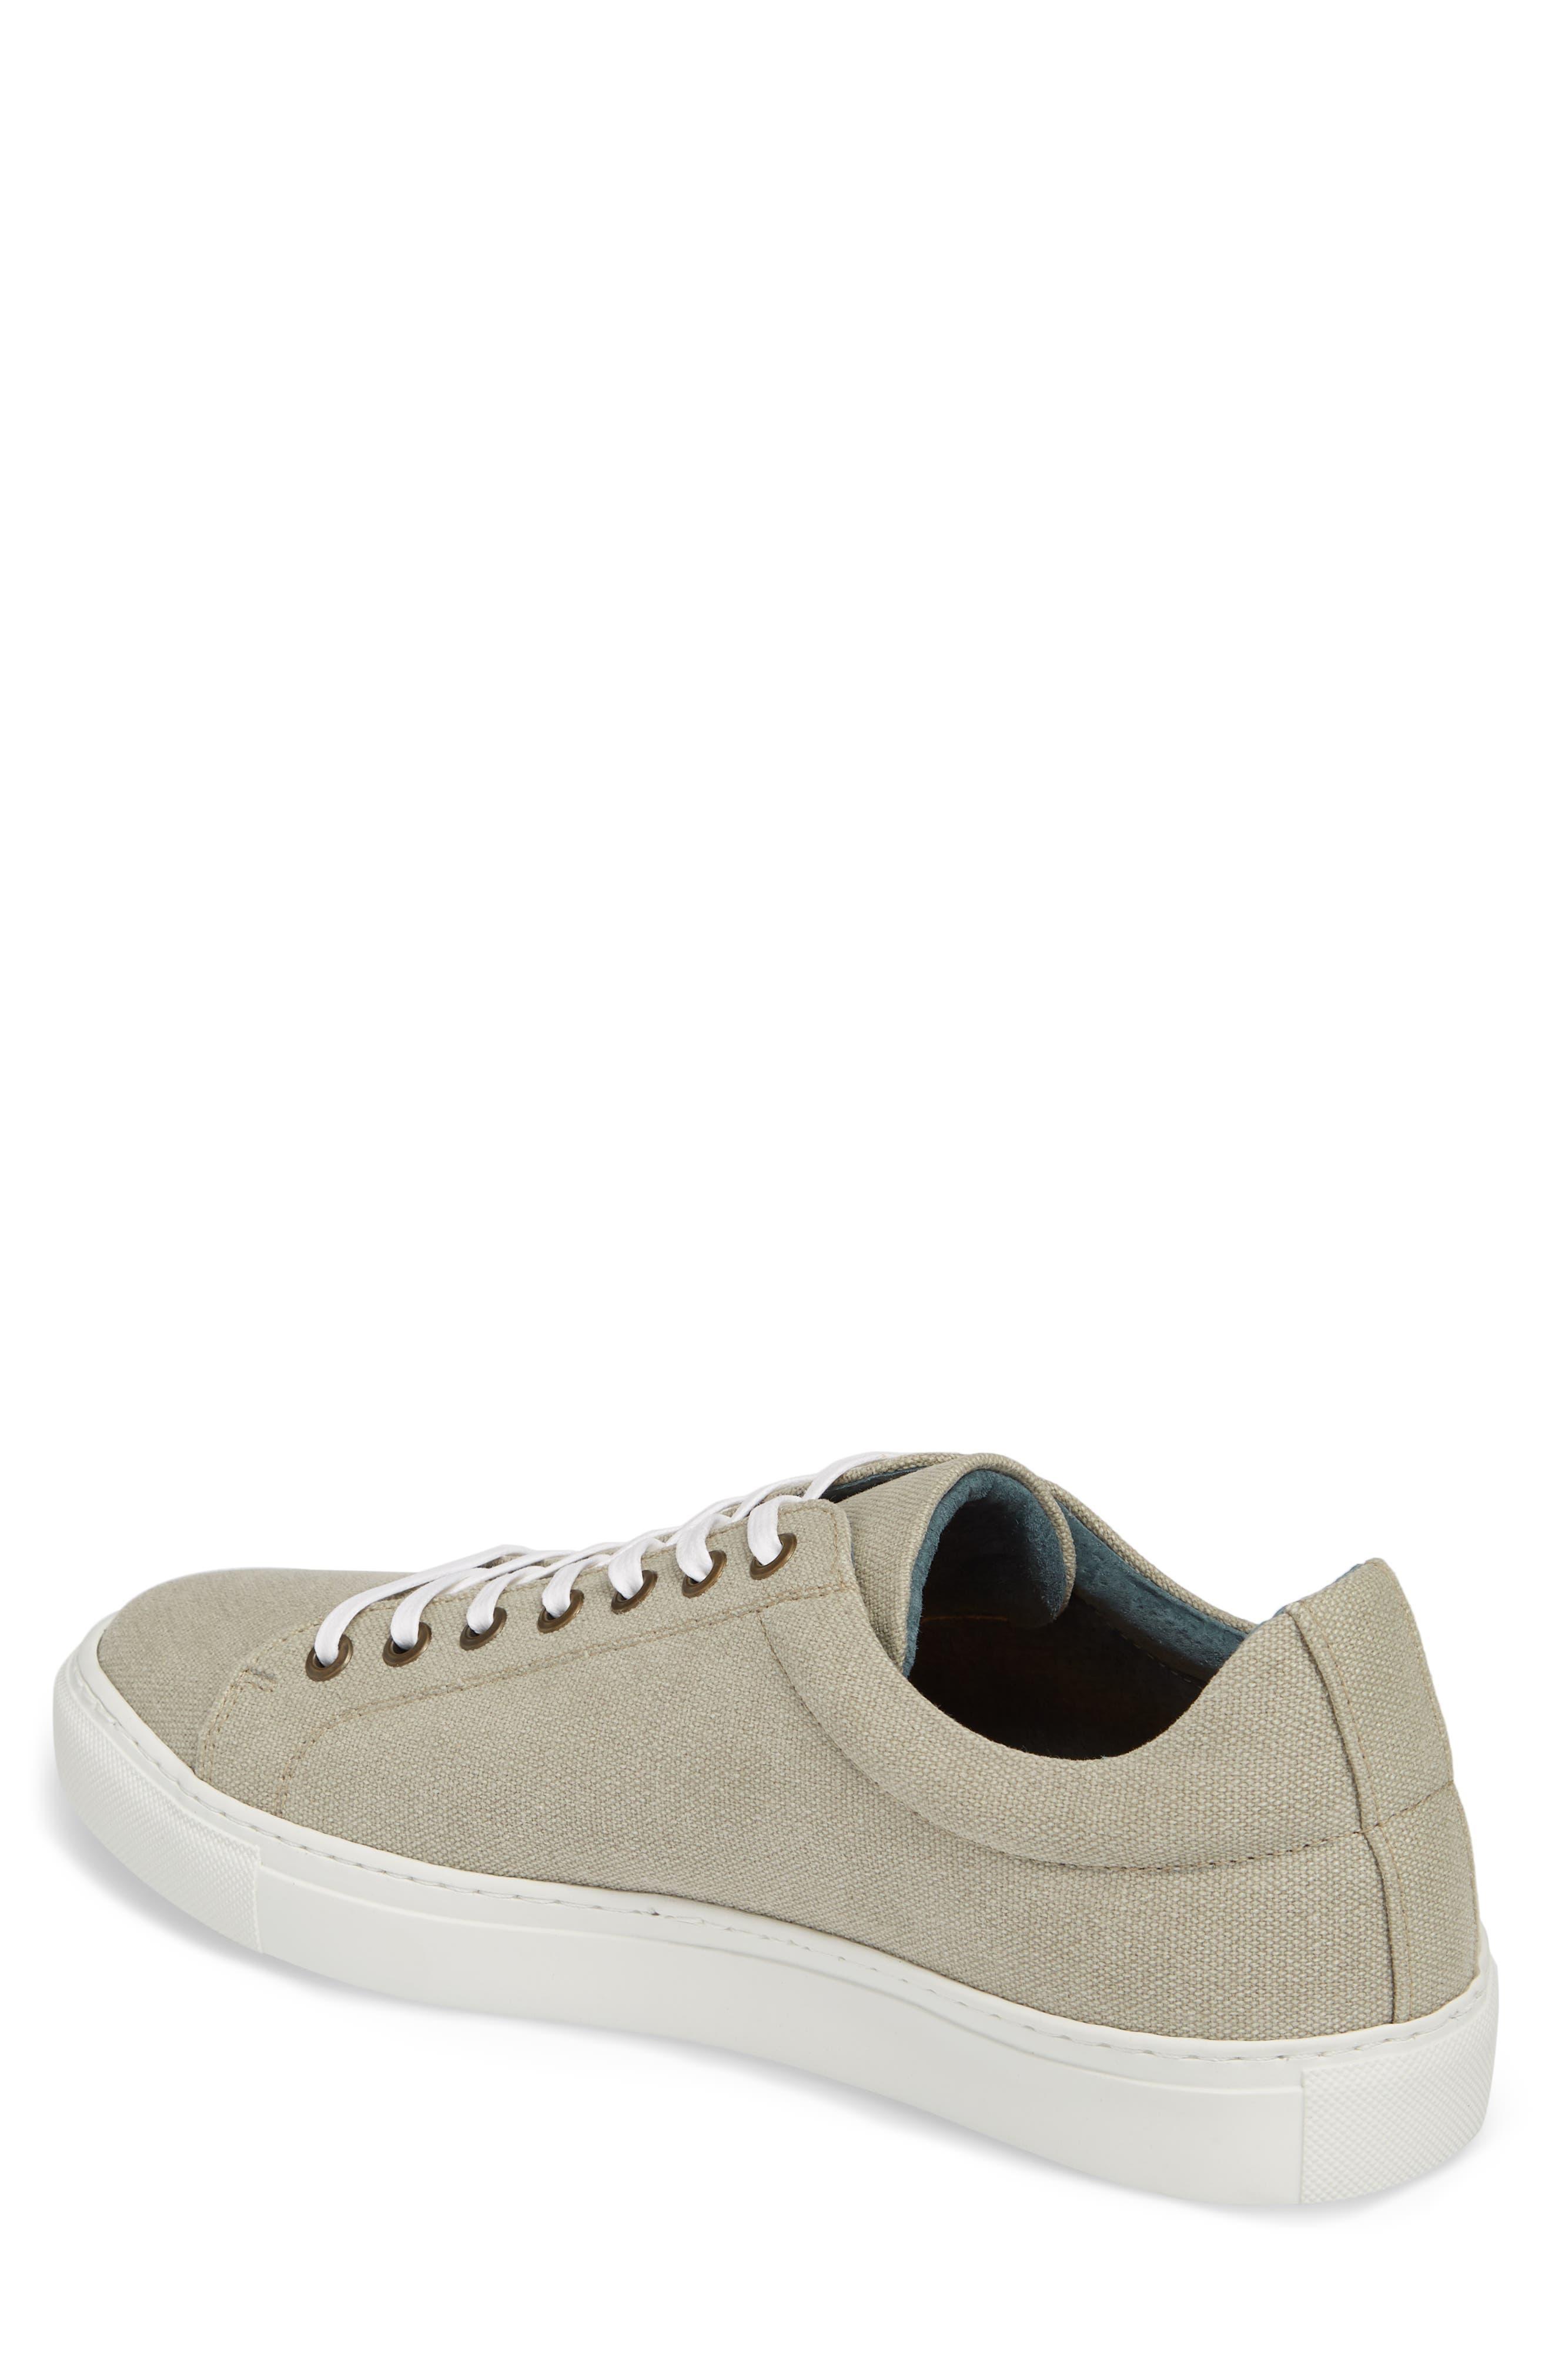 Mark Low Top Sneaker,                             Alternate thumbnail 4, color,